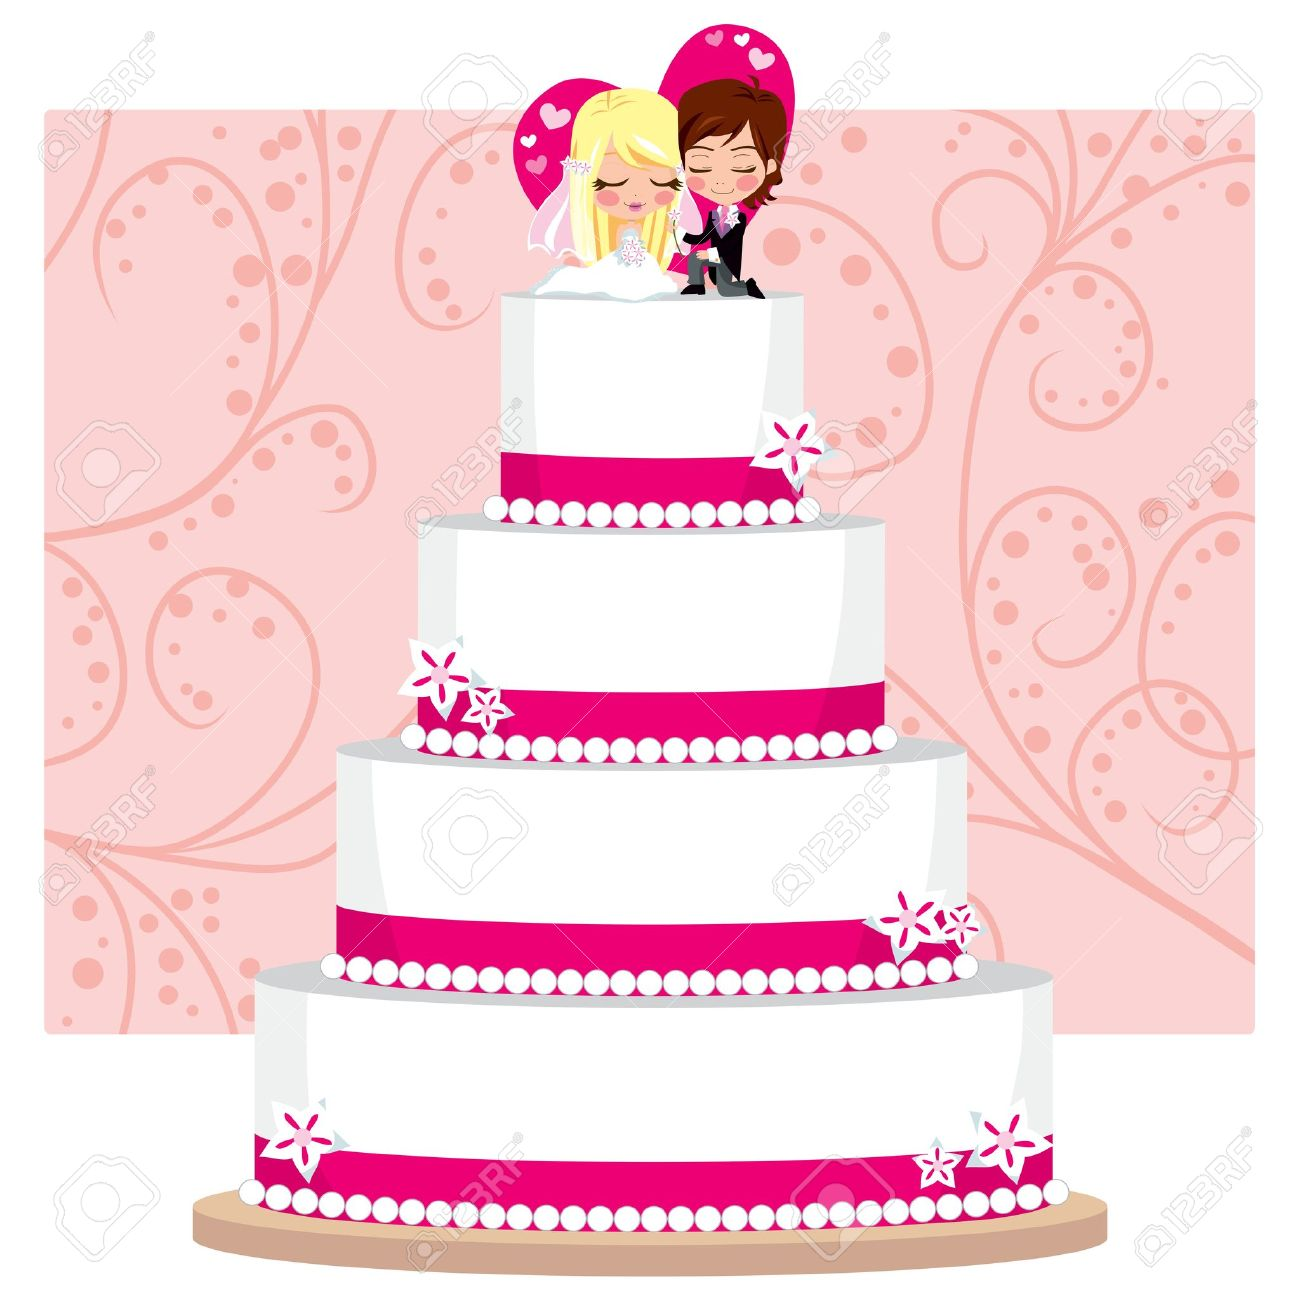 1300x1300 Wedding Cake Drawing Template Wedding Cake Drawing Template